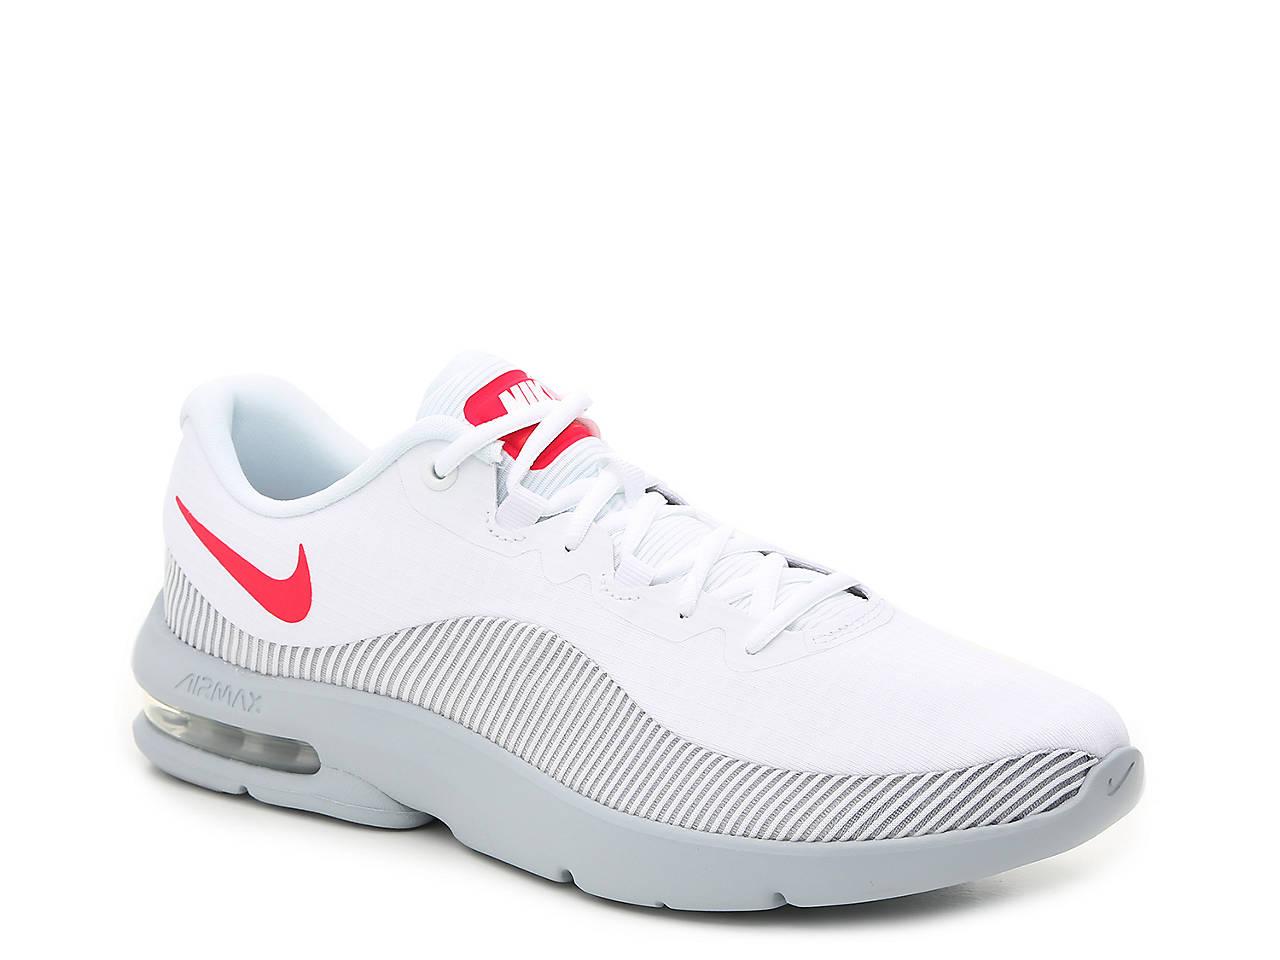 Nike Air Max Advantage 2 Shoes, Mens Size 8